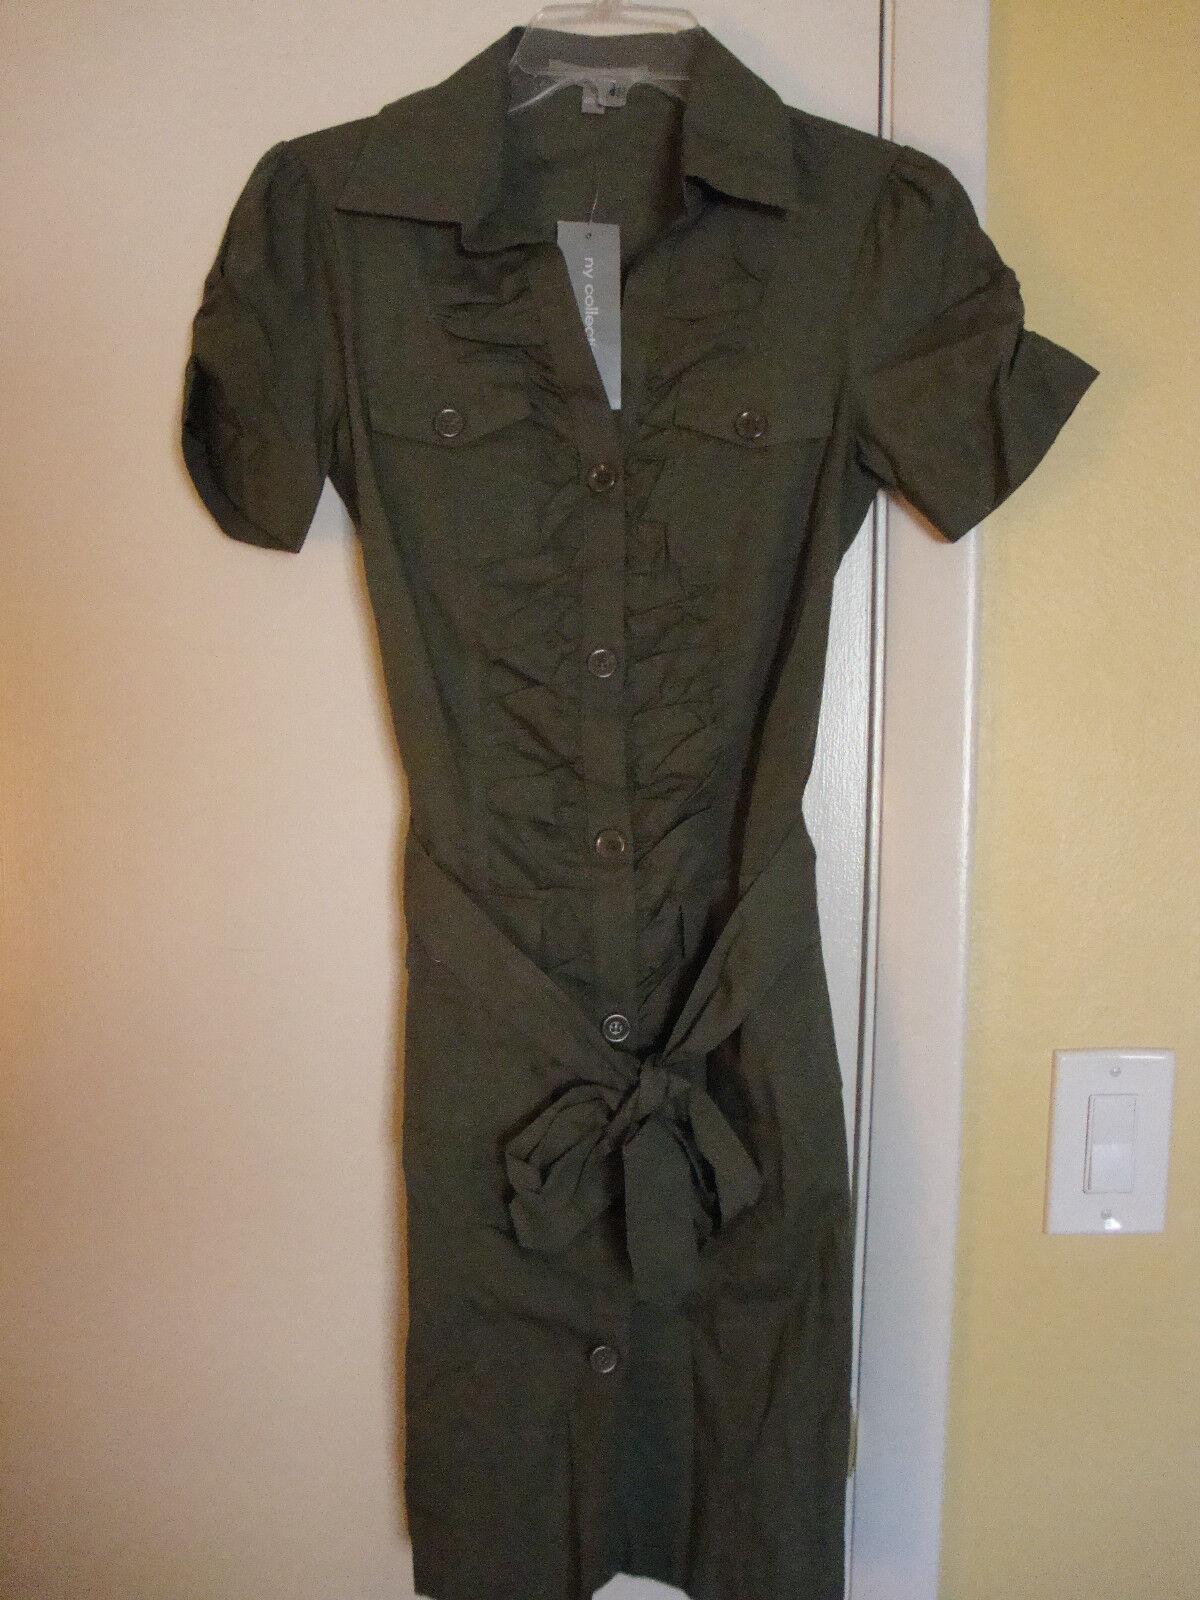 New Womens NY Collection Moss Green Sleeveless Dress Size Medium